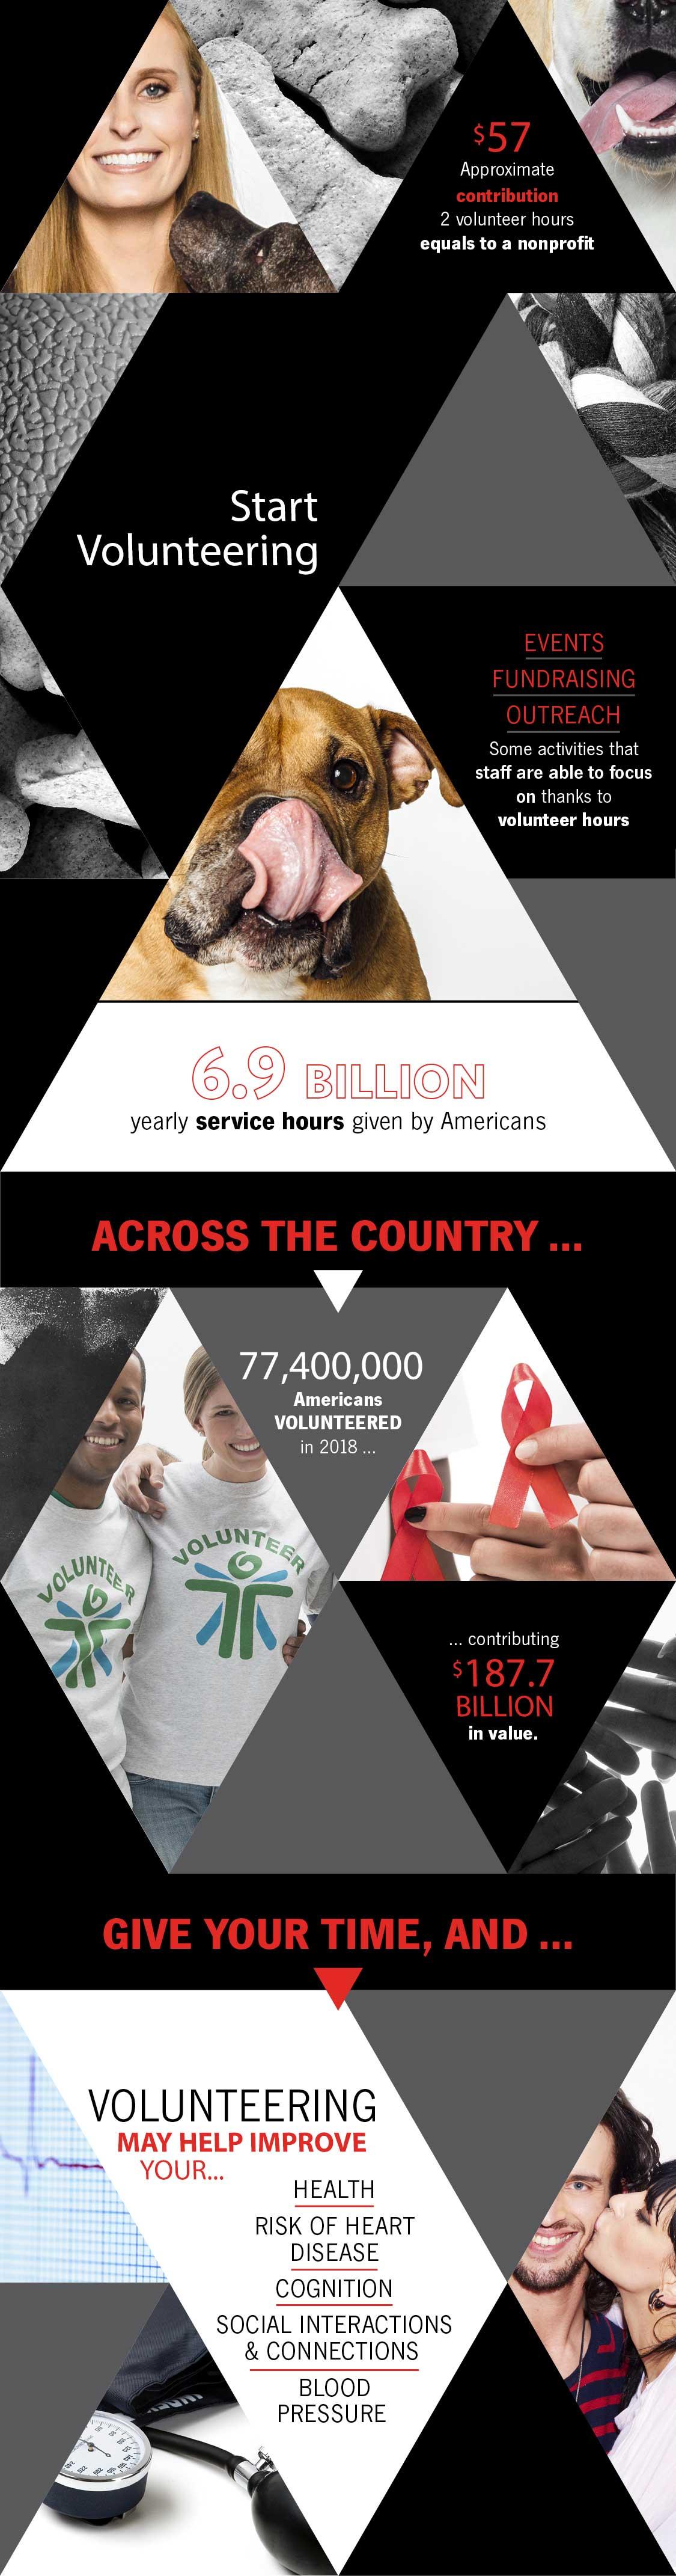 how to start volunteering infographic